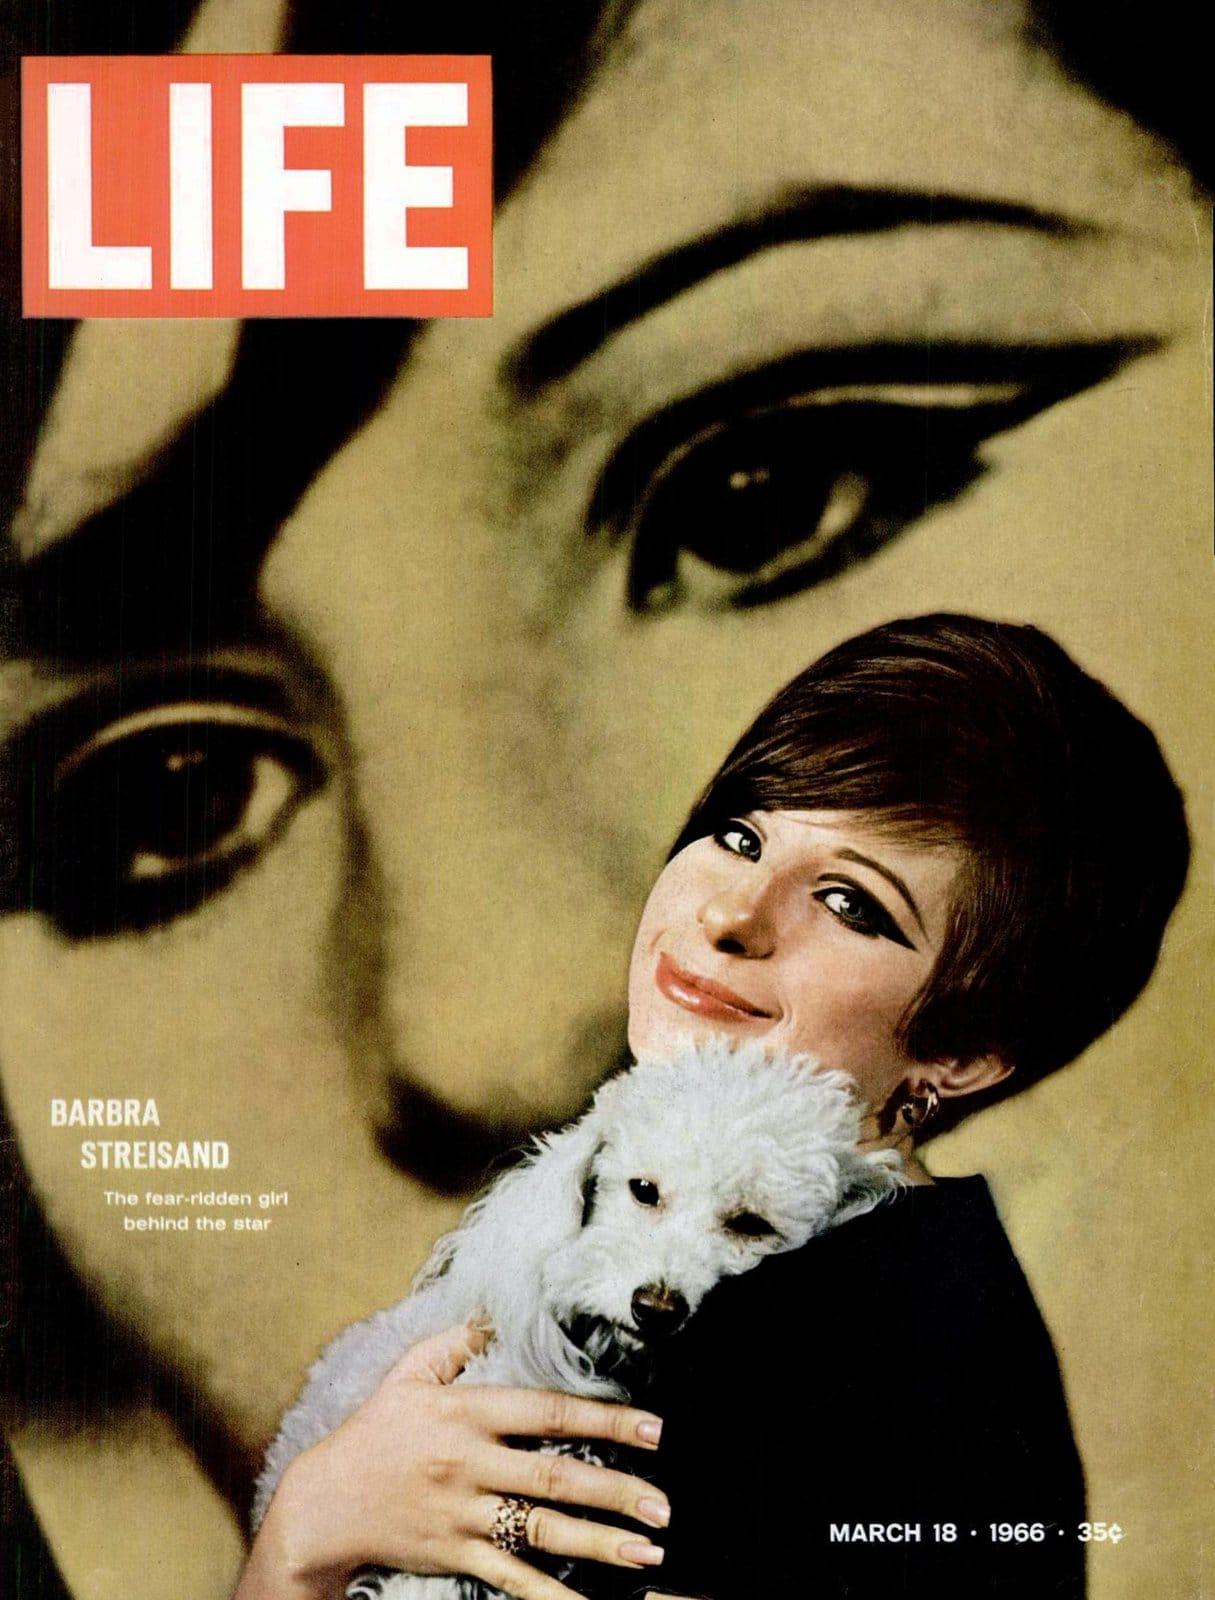 Barbra Streisand on the cover of LIFE (1966)